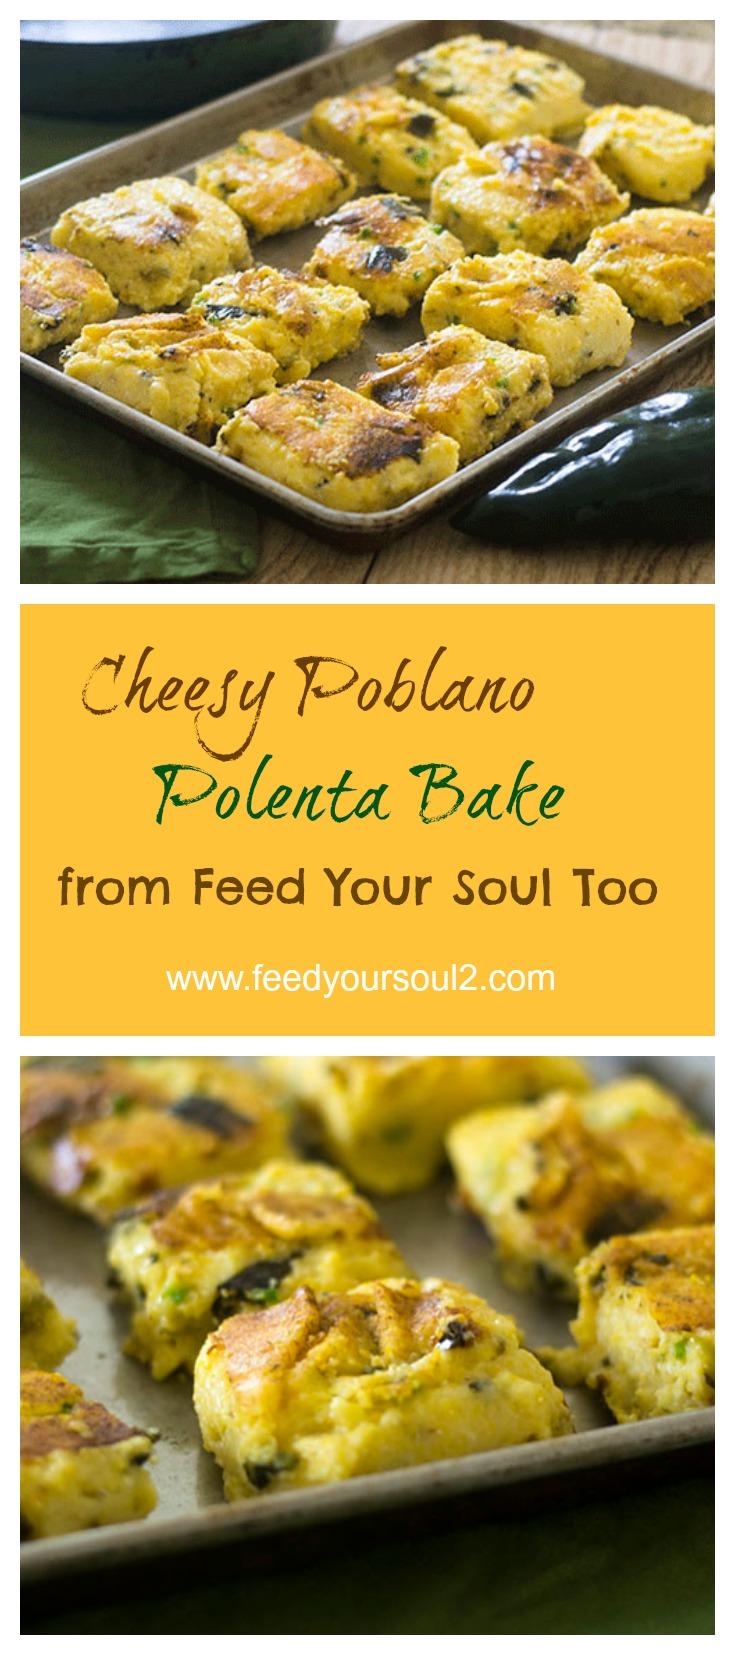 Cheesy Poblano Polenta Bake #sidedish #polenta #poblanos | feedyoursoul2.com